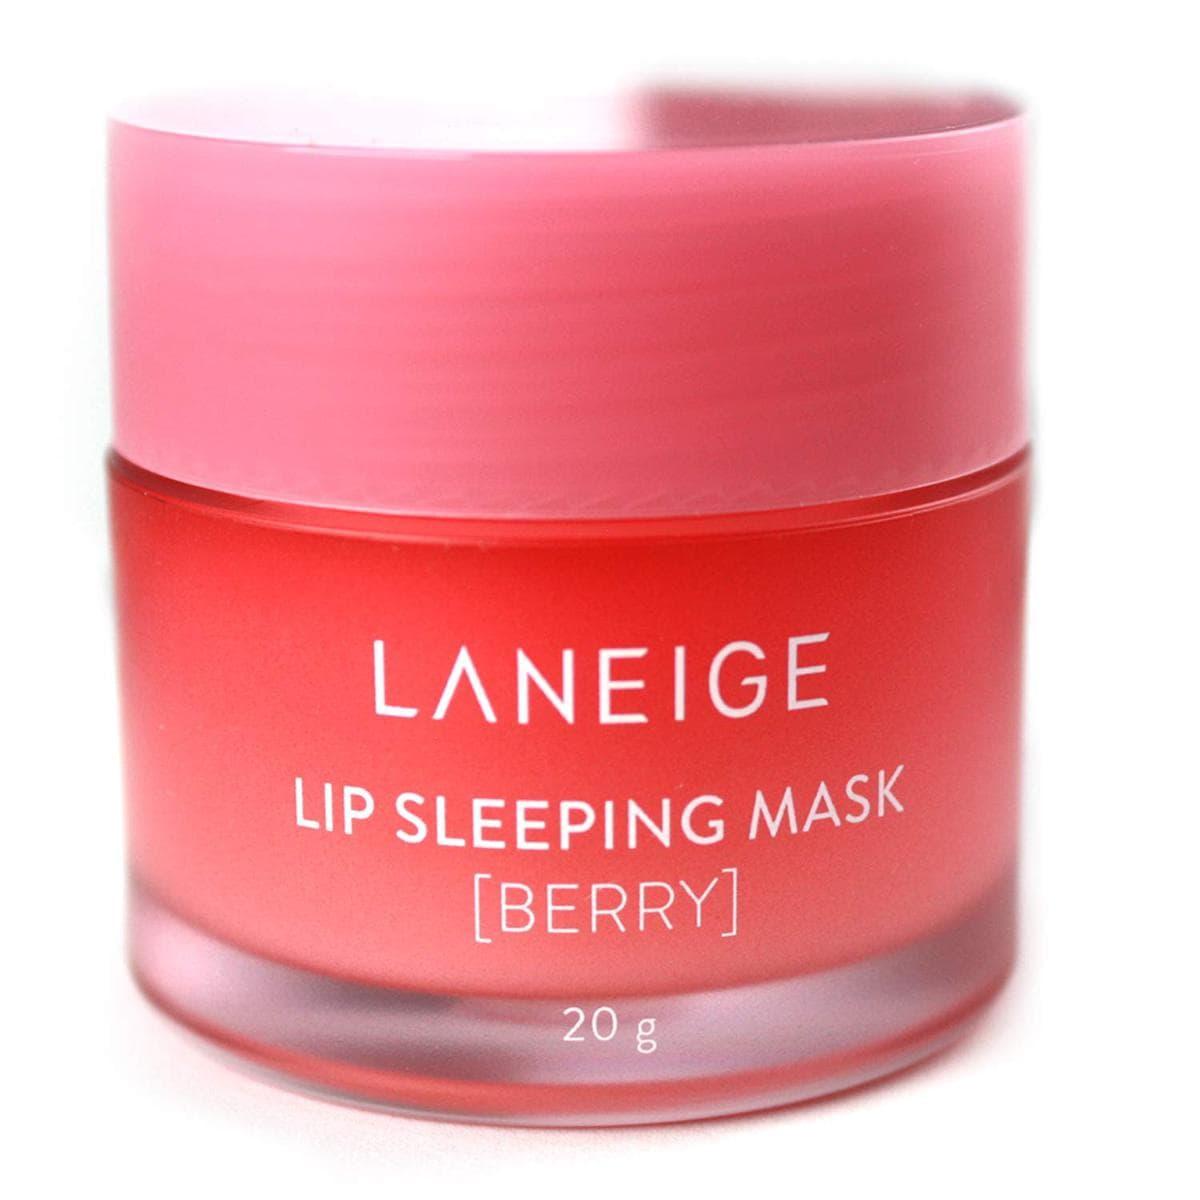 Laneige Lip Sleeping Mask, Berry